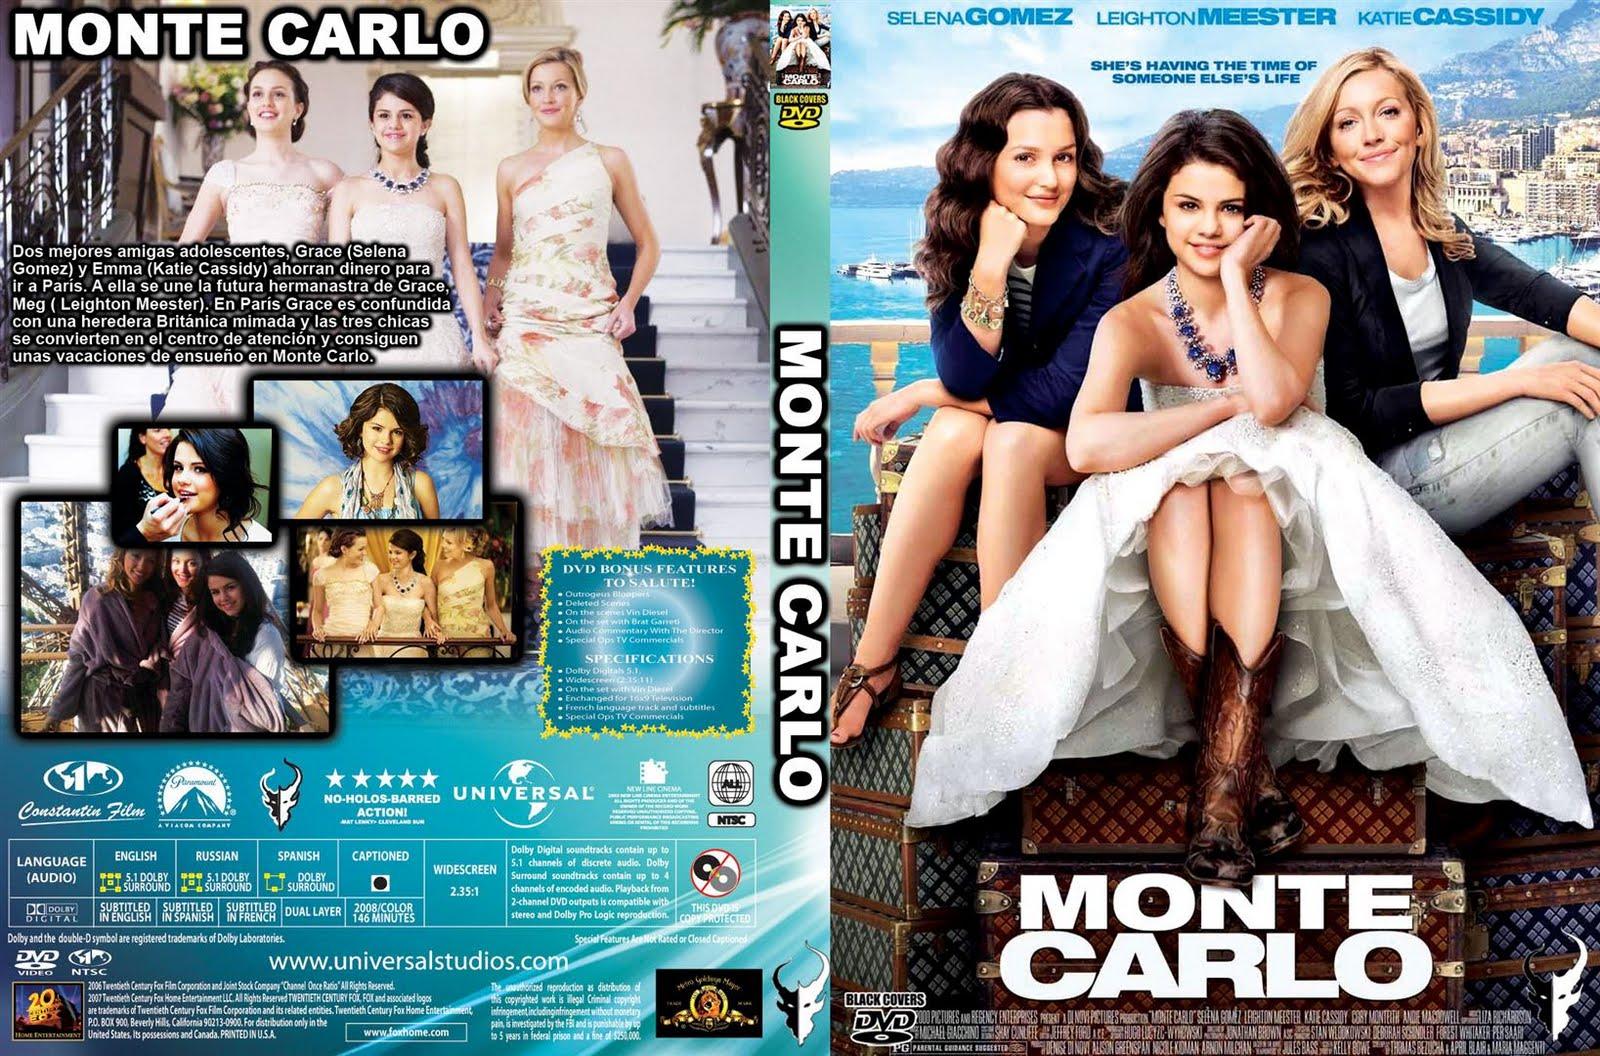 http://4.bp.blogspot.com/-I5ejzr_jhXQ/TpTa0zKKWGI/AAAAAAAADZM/SnjPORm4aqI/s1600/Monte_Carlo.jpg